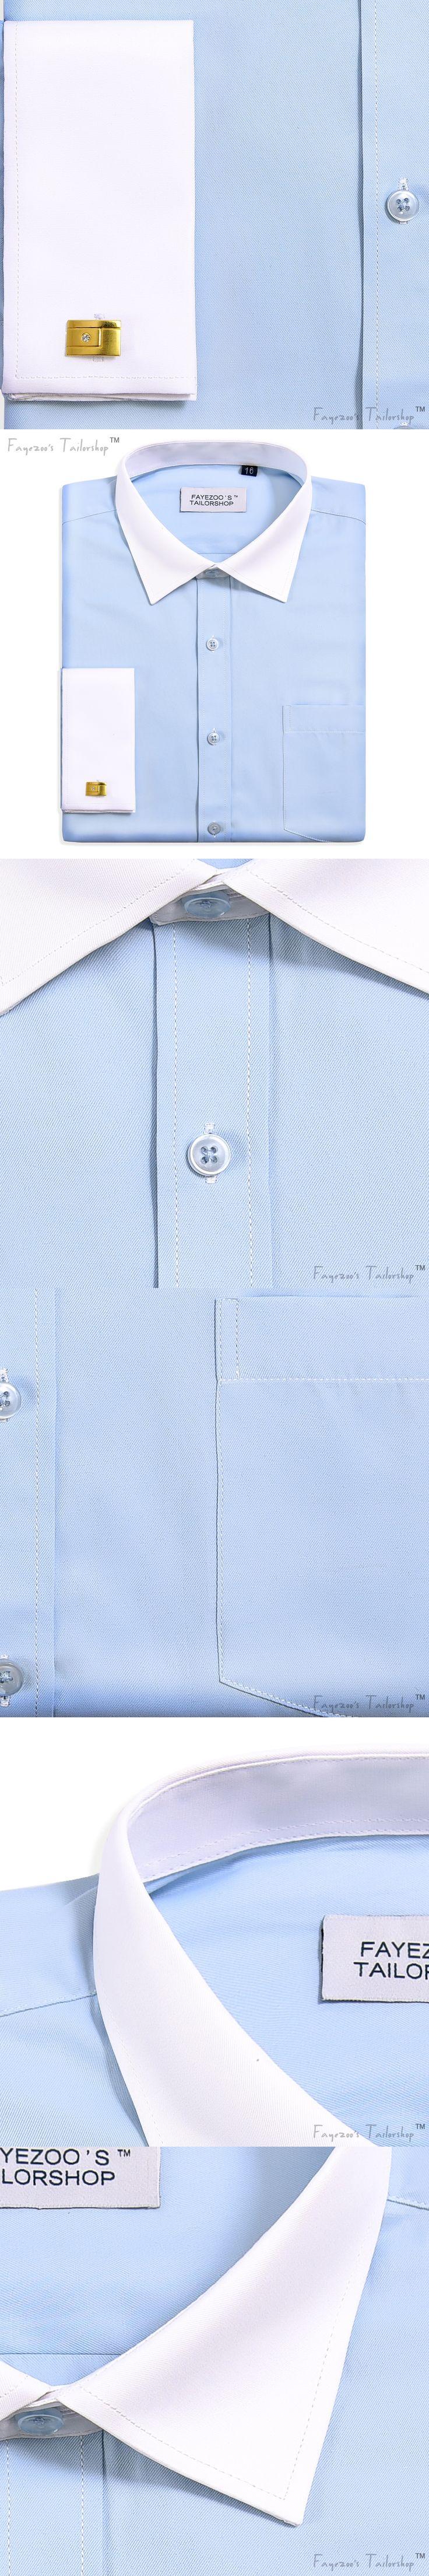 Men's Non Iron French Cuff Contrast Spread Collar Light Blue Formal Business Dress Shirt Sheen & Soft Long Sleeve